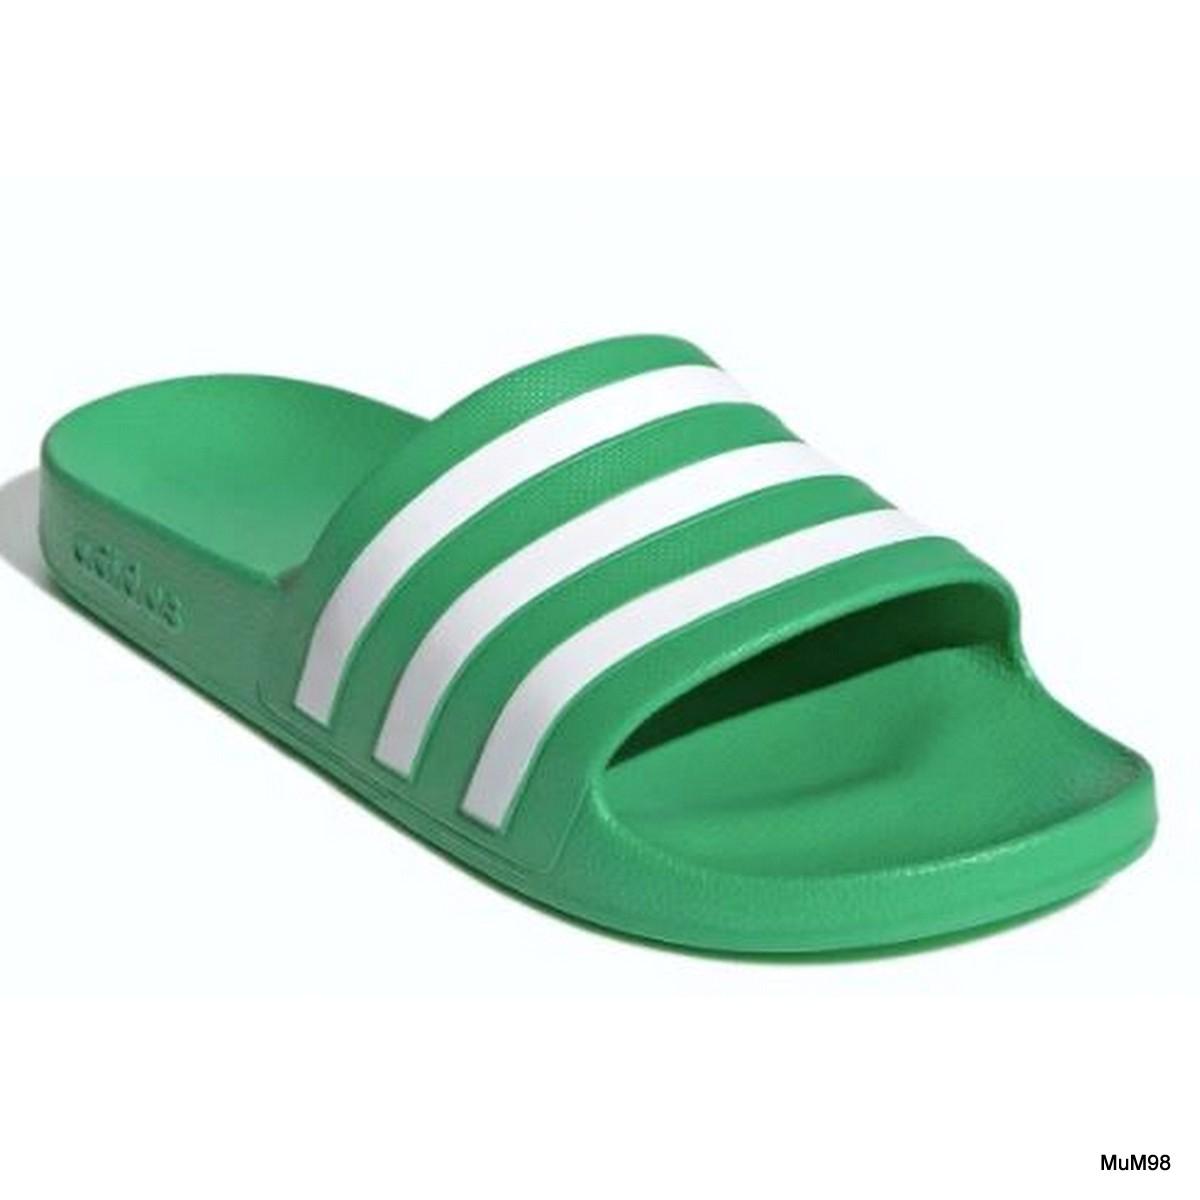 AQUA ADILETTE Adidas